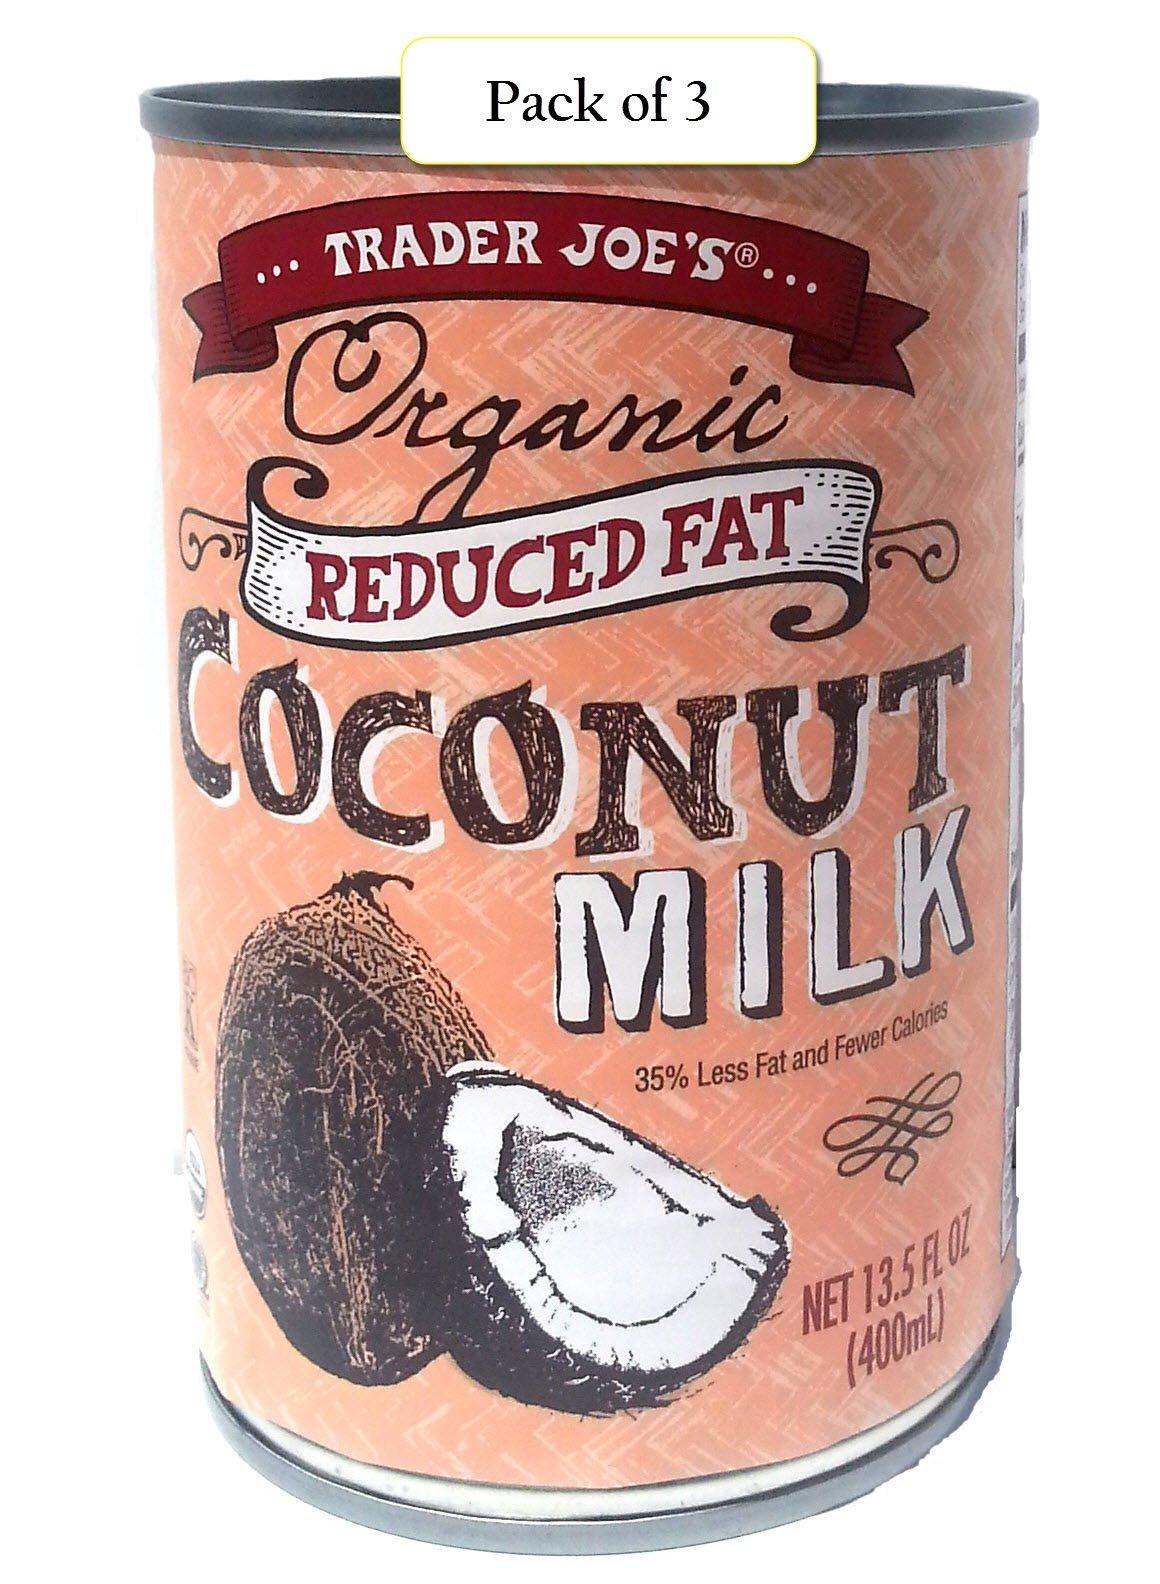 Trader Joe's Organic Coconut Milk, Reduced Fat, 13.5oz / 400 ml (Pack of 3) - Coconut Water